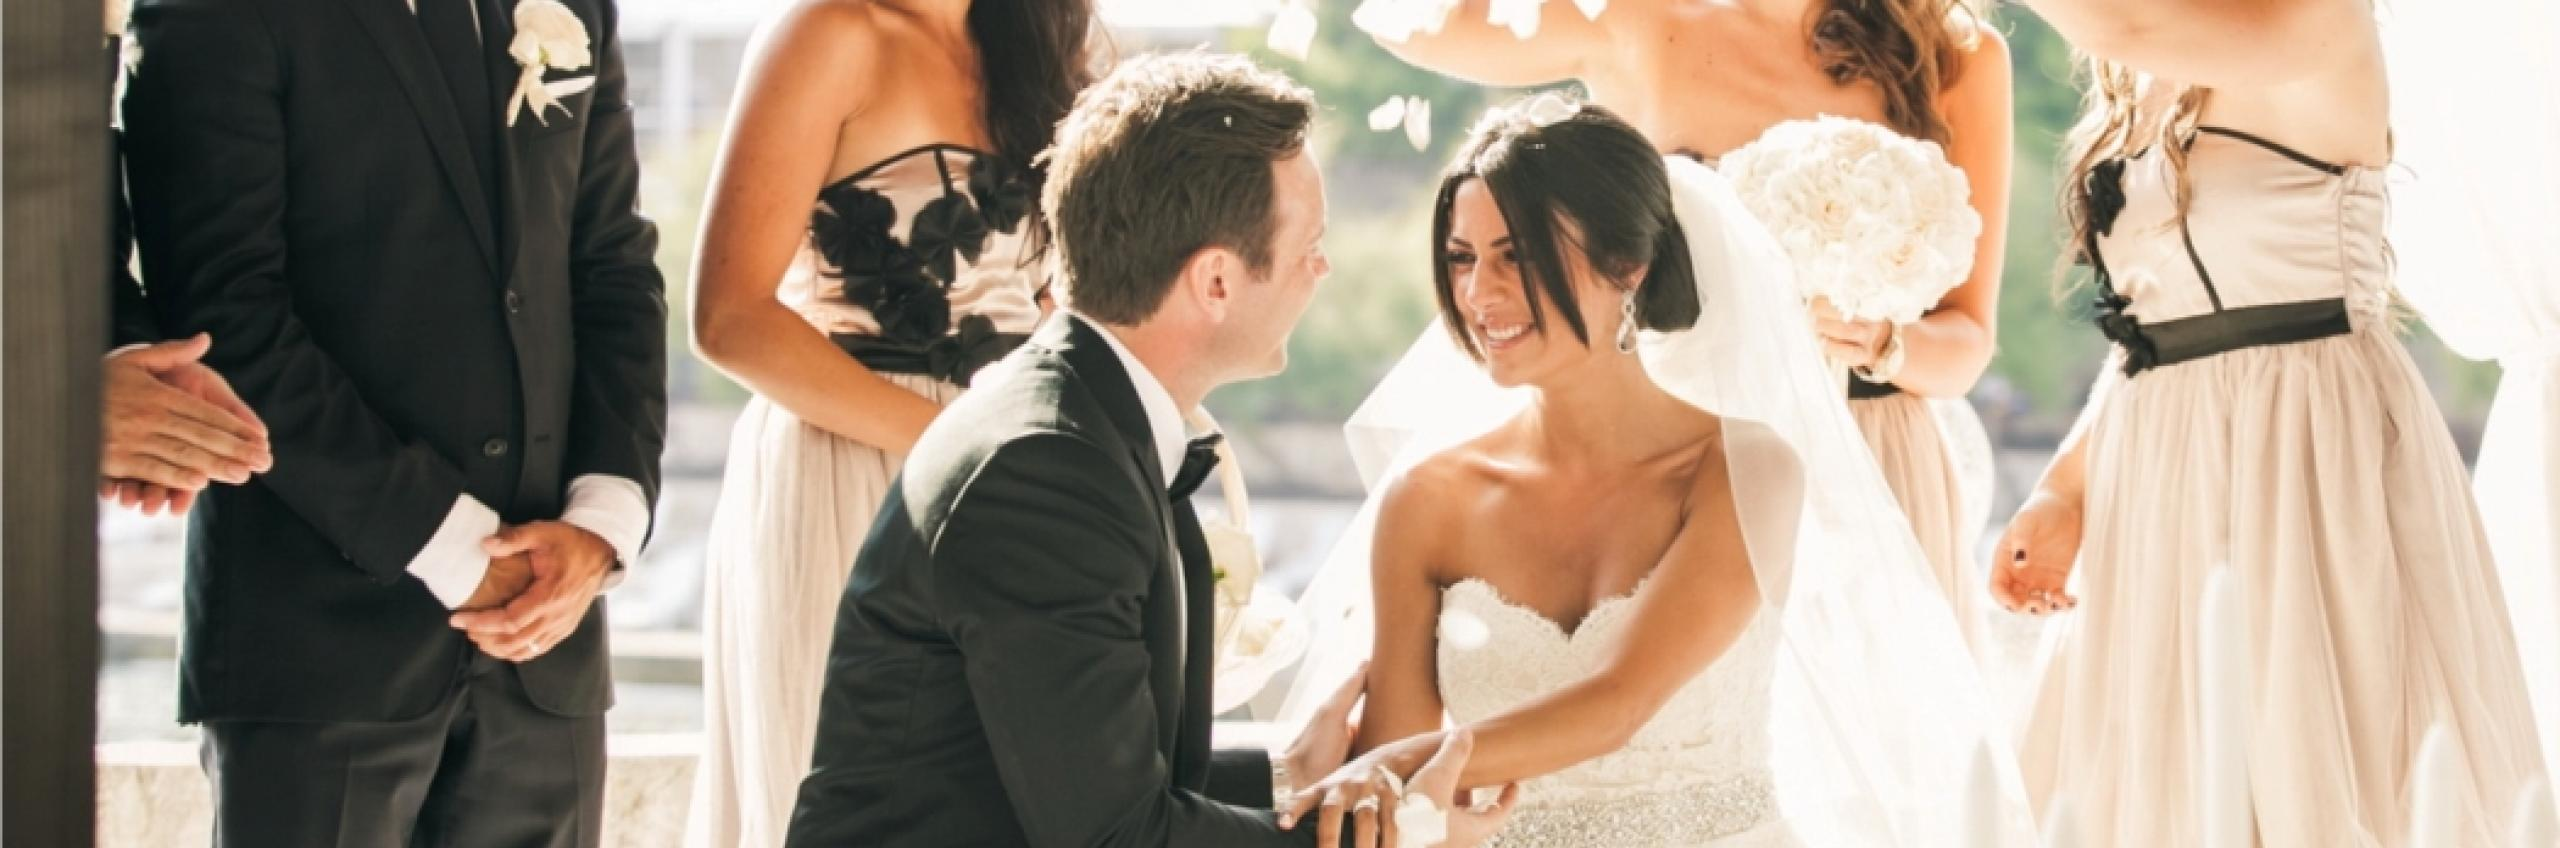 Perfect wedding abroad